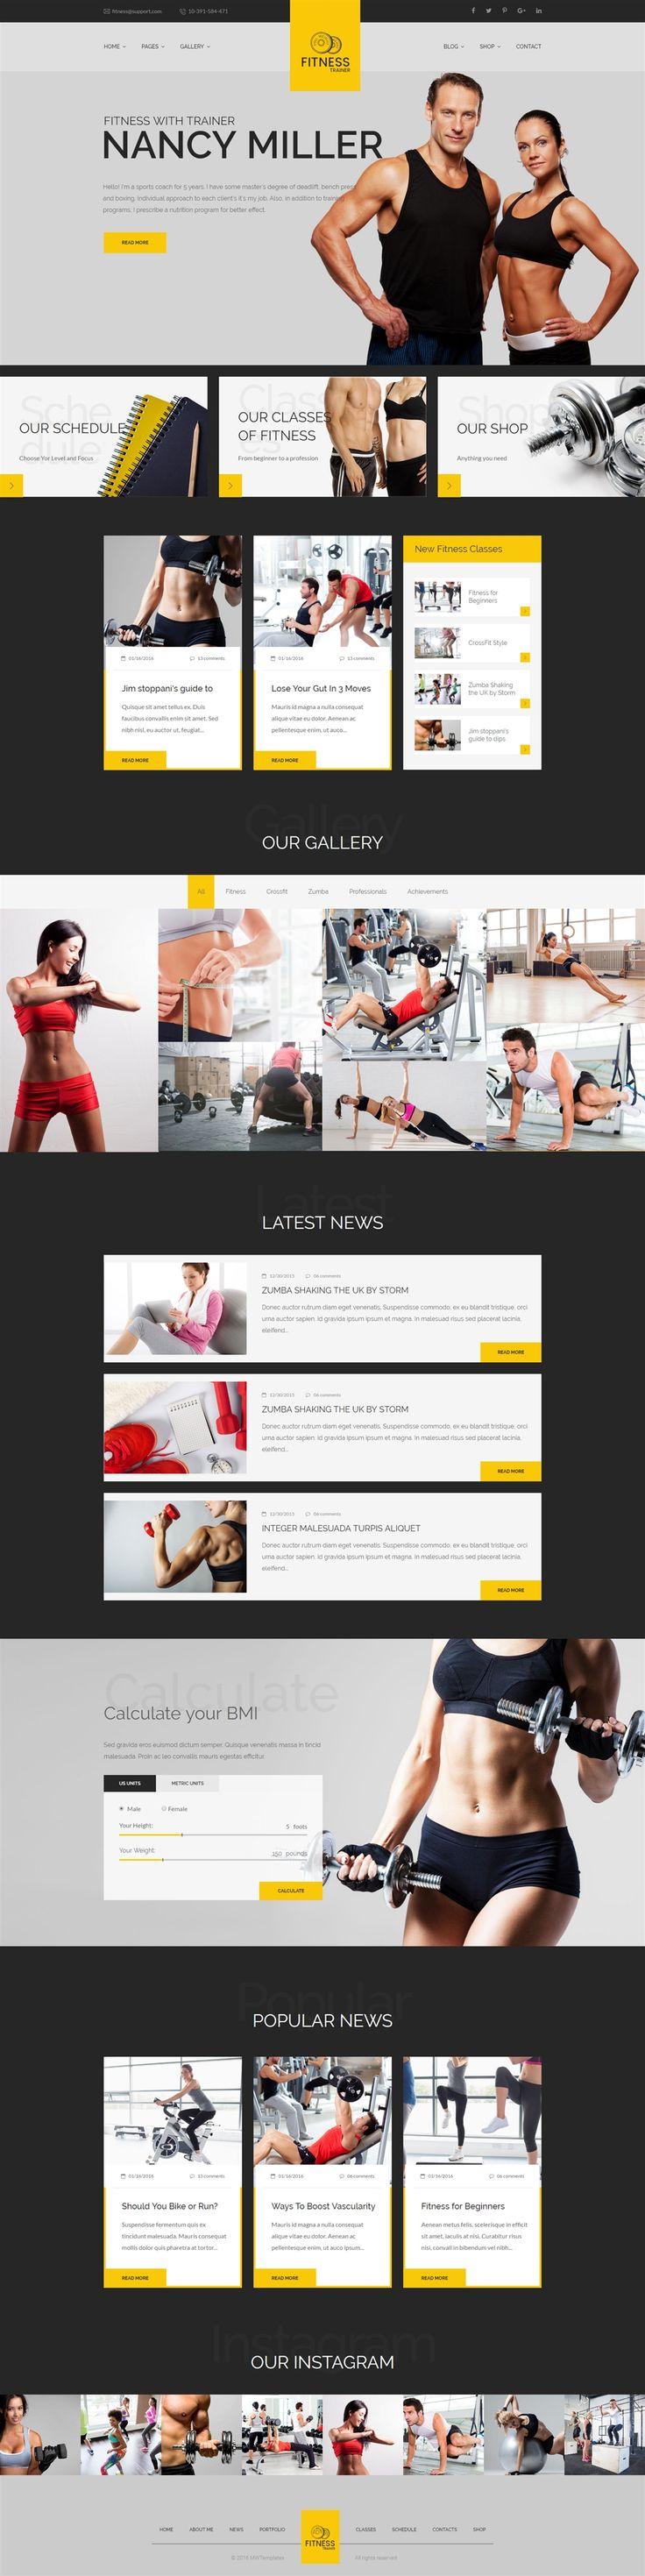 158 best Site Templates images on Pinterest | Design web, Design ...